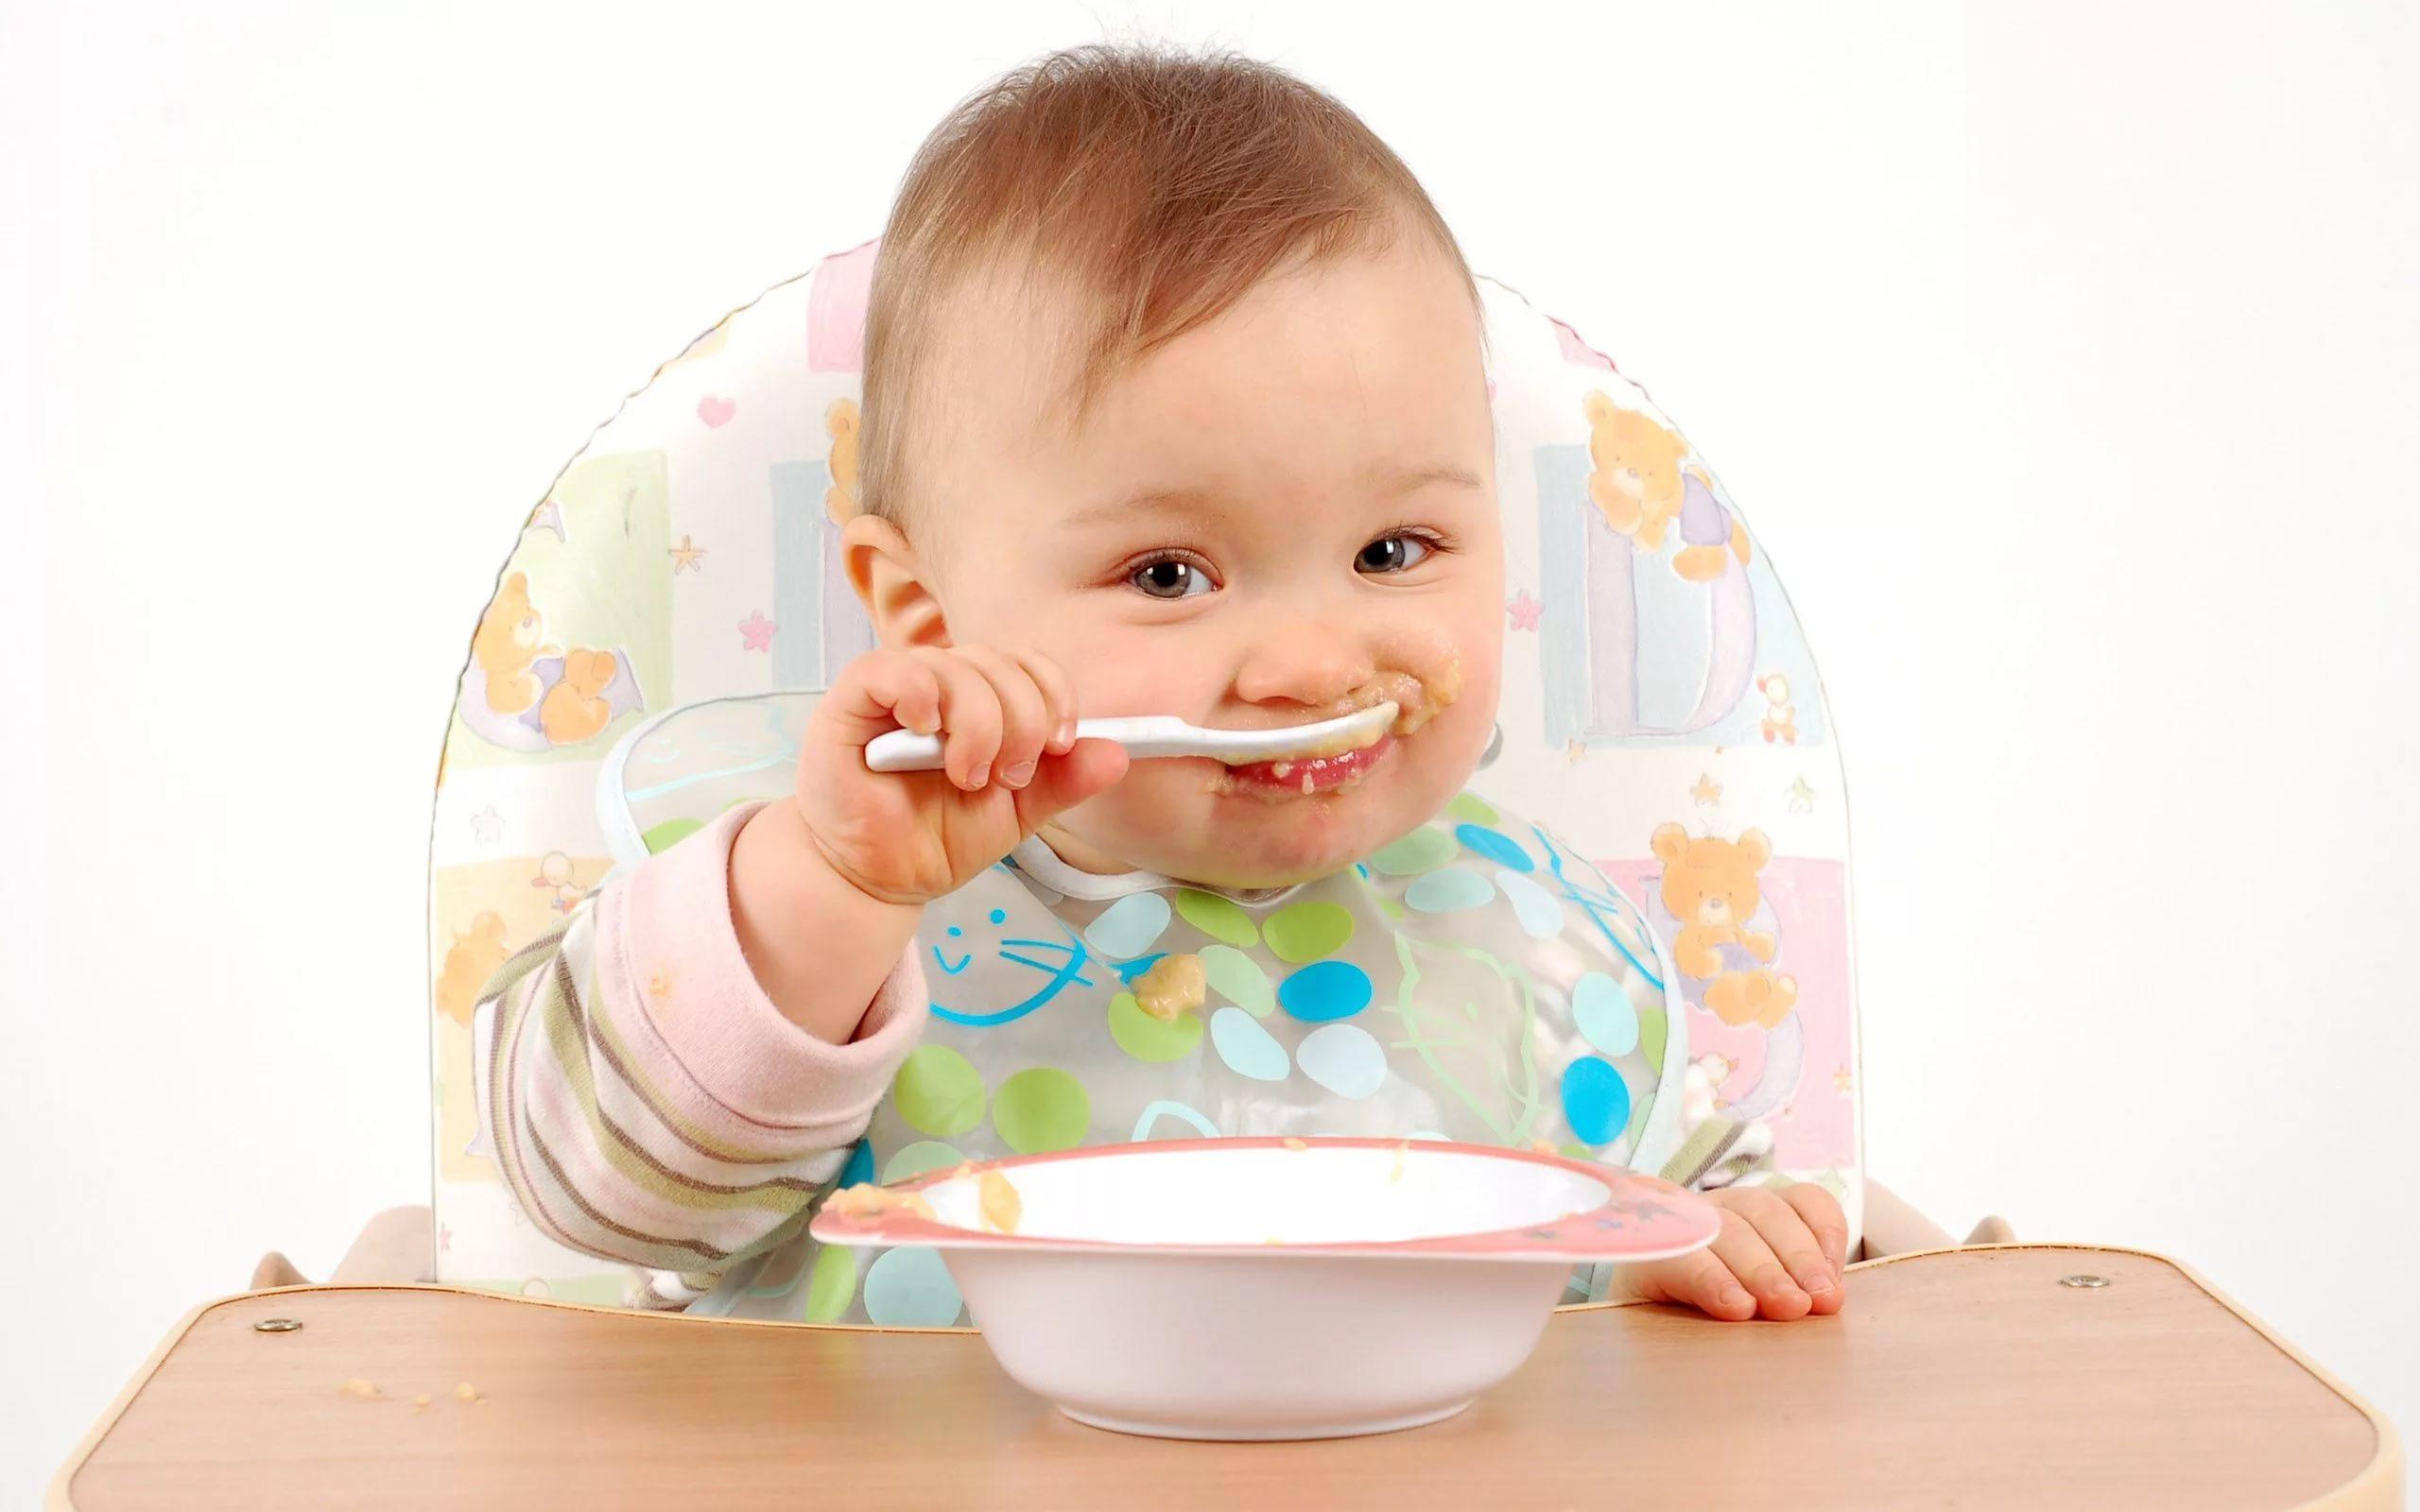 Если младенец набрал мало веса